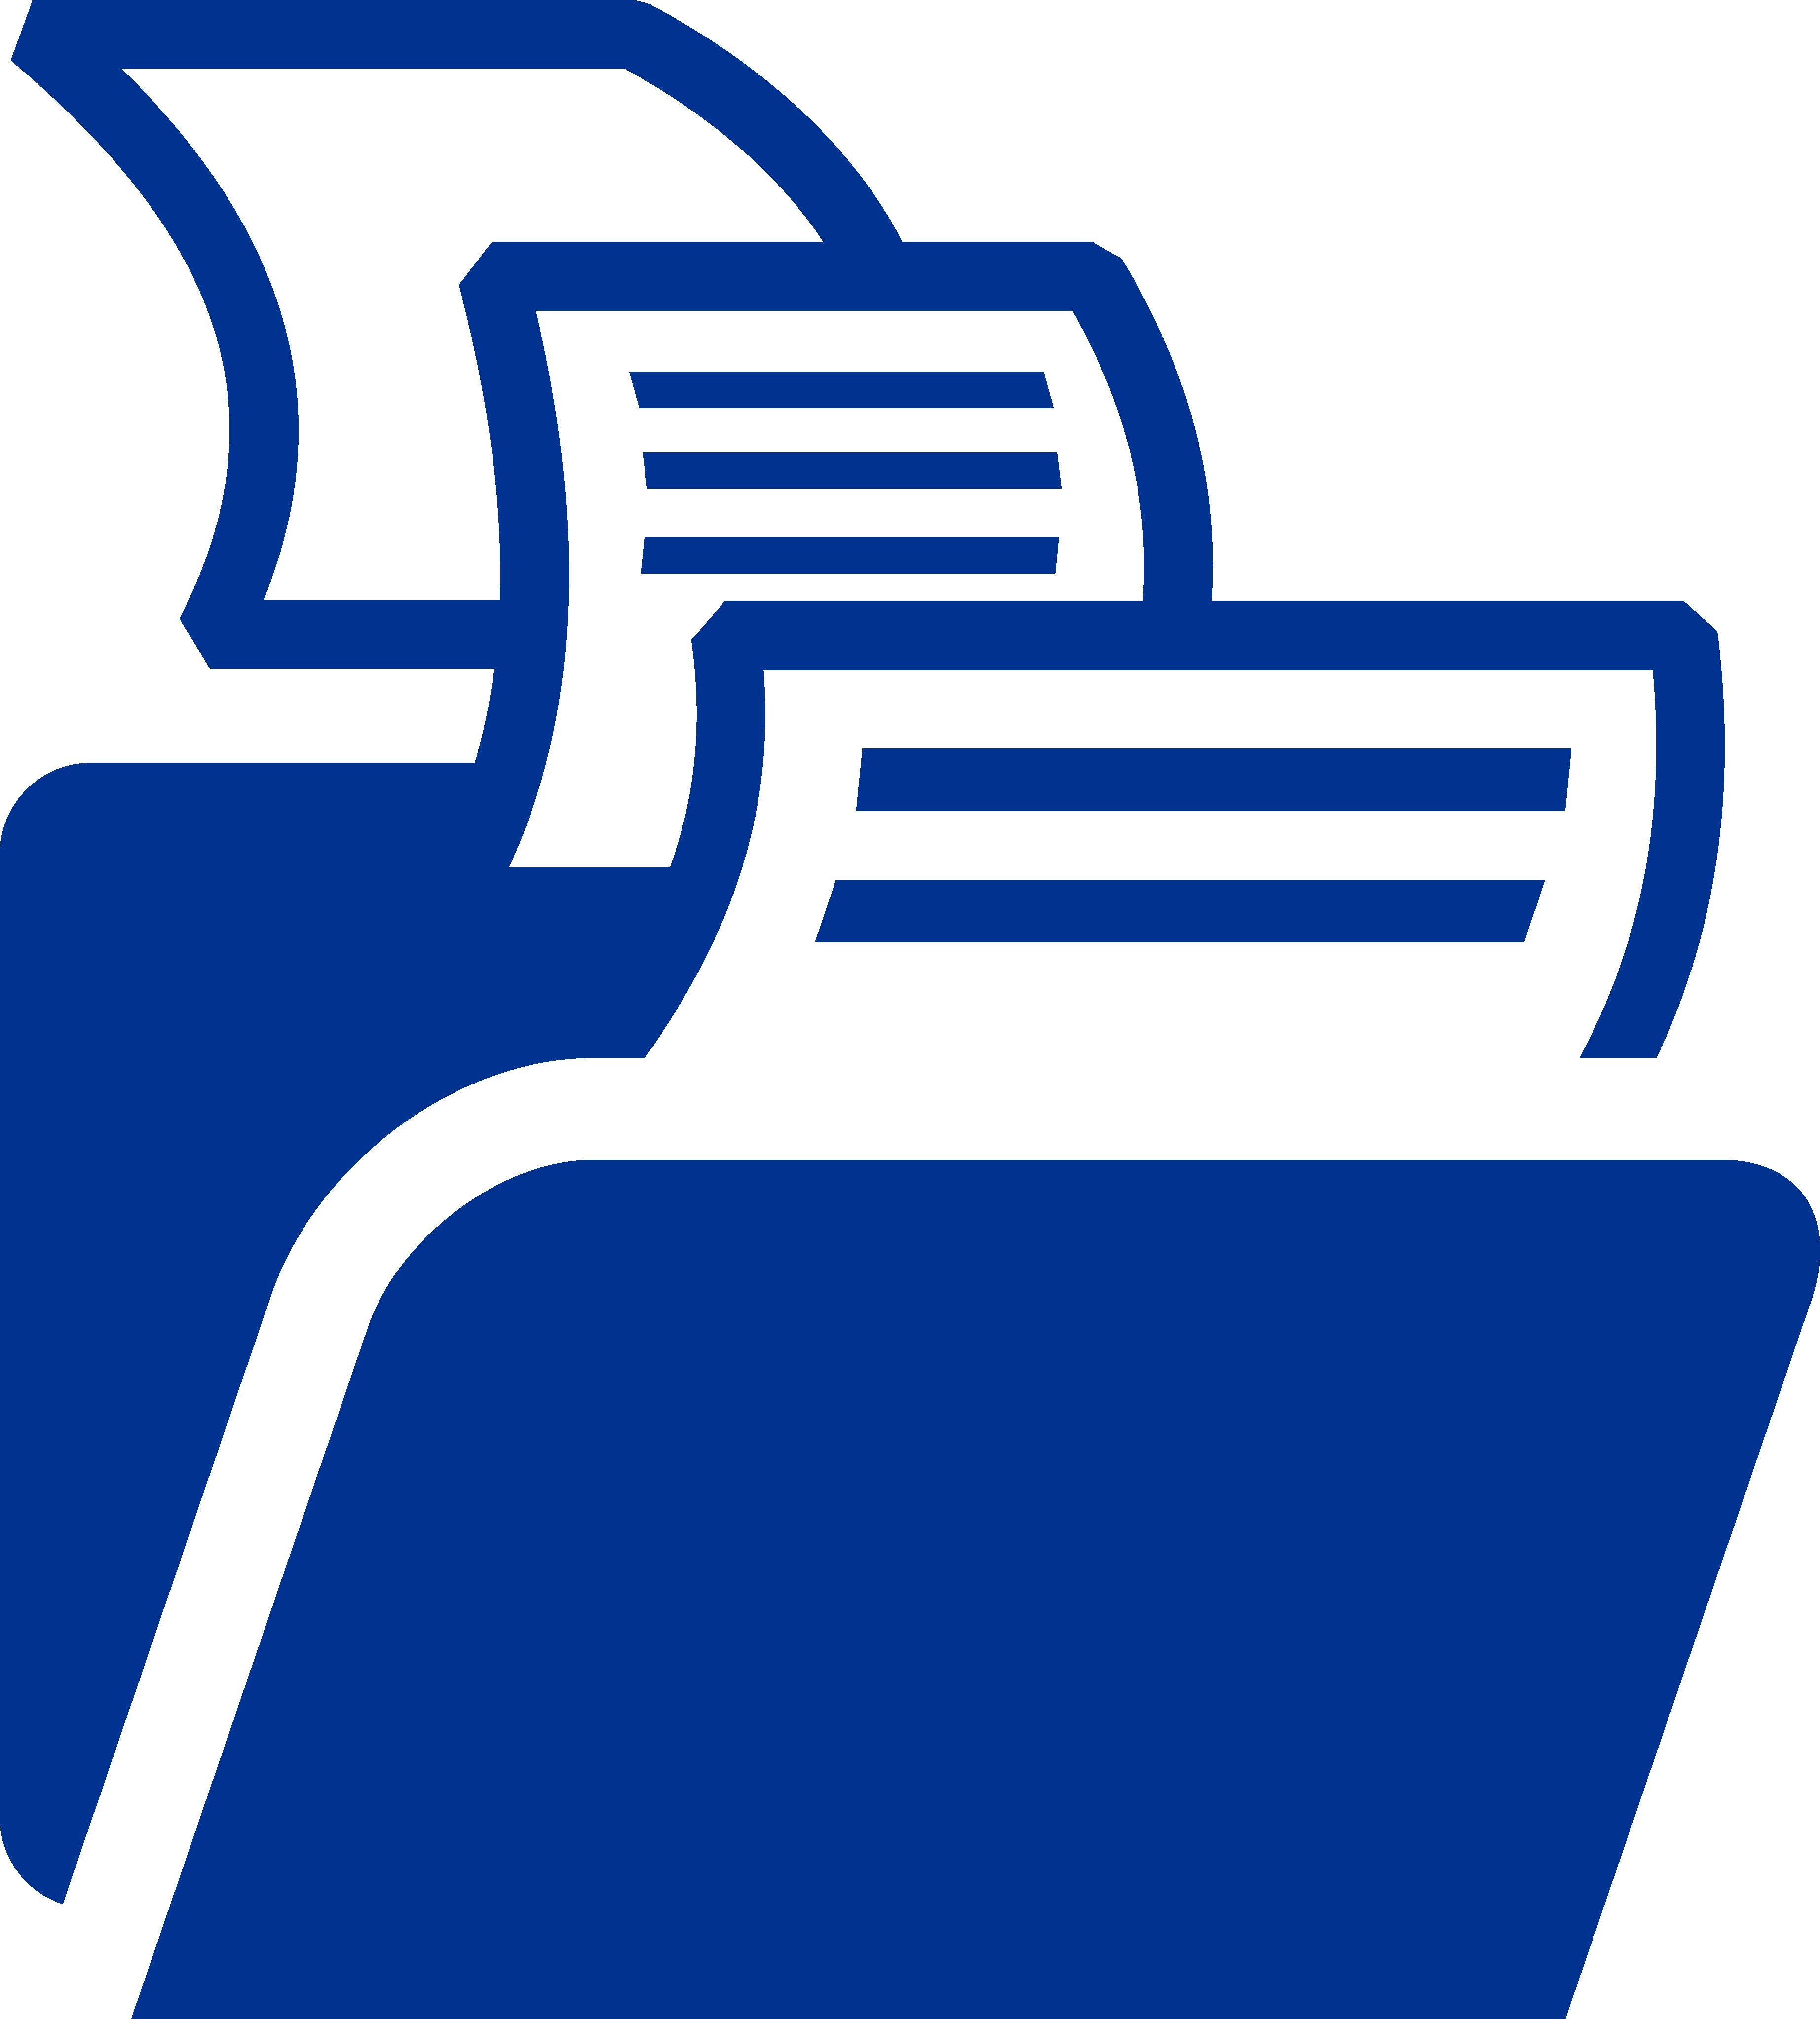 blue file folders icon